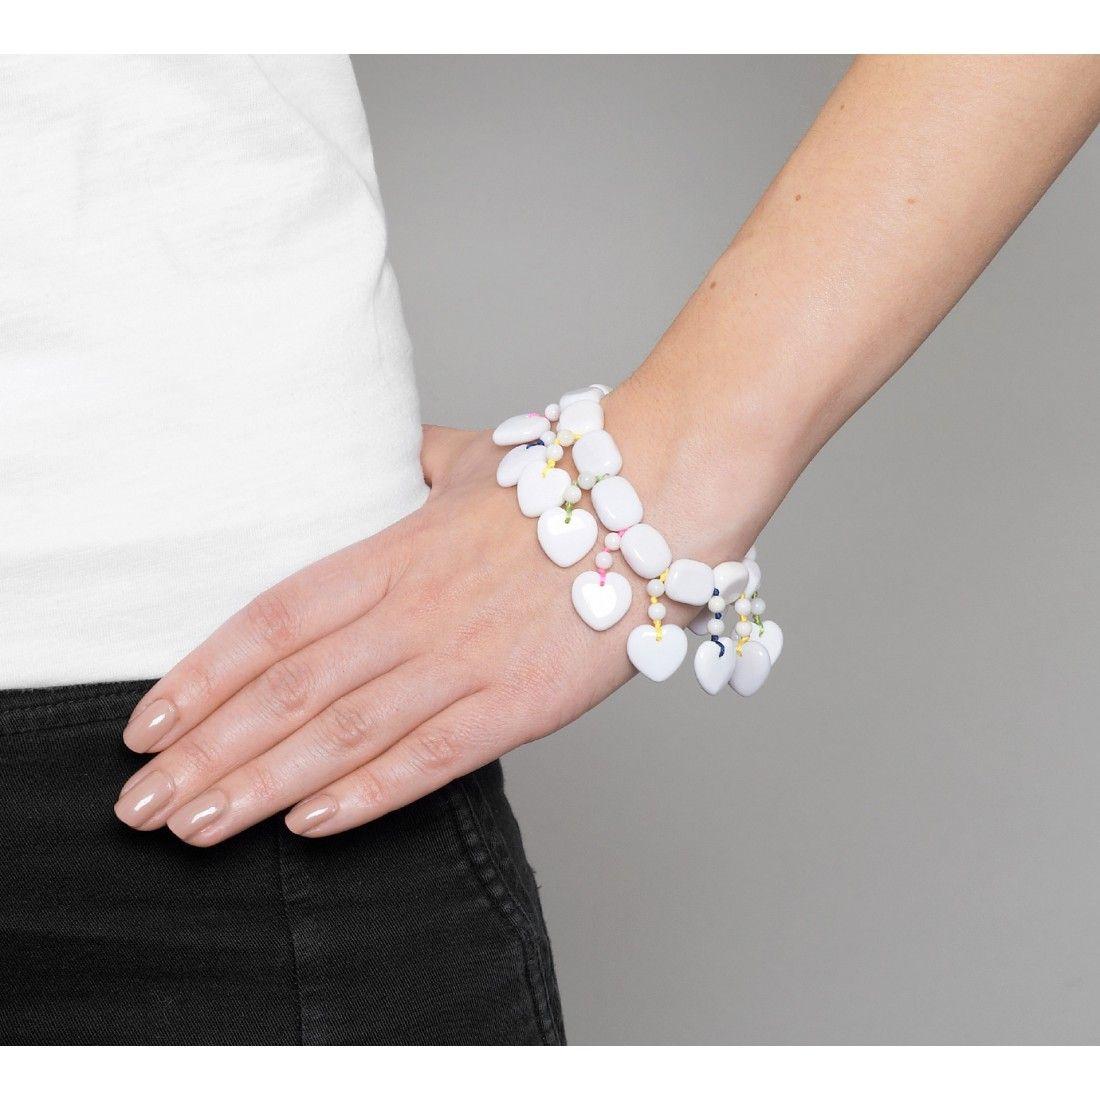 Lola Rose Bracelets-Juel Bracelet | LolaRose.co.uk